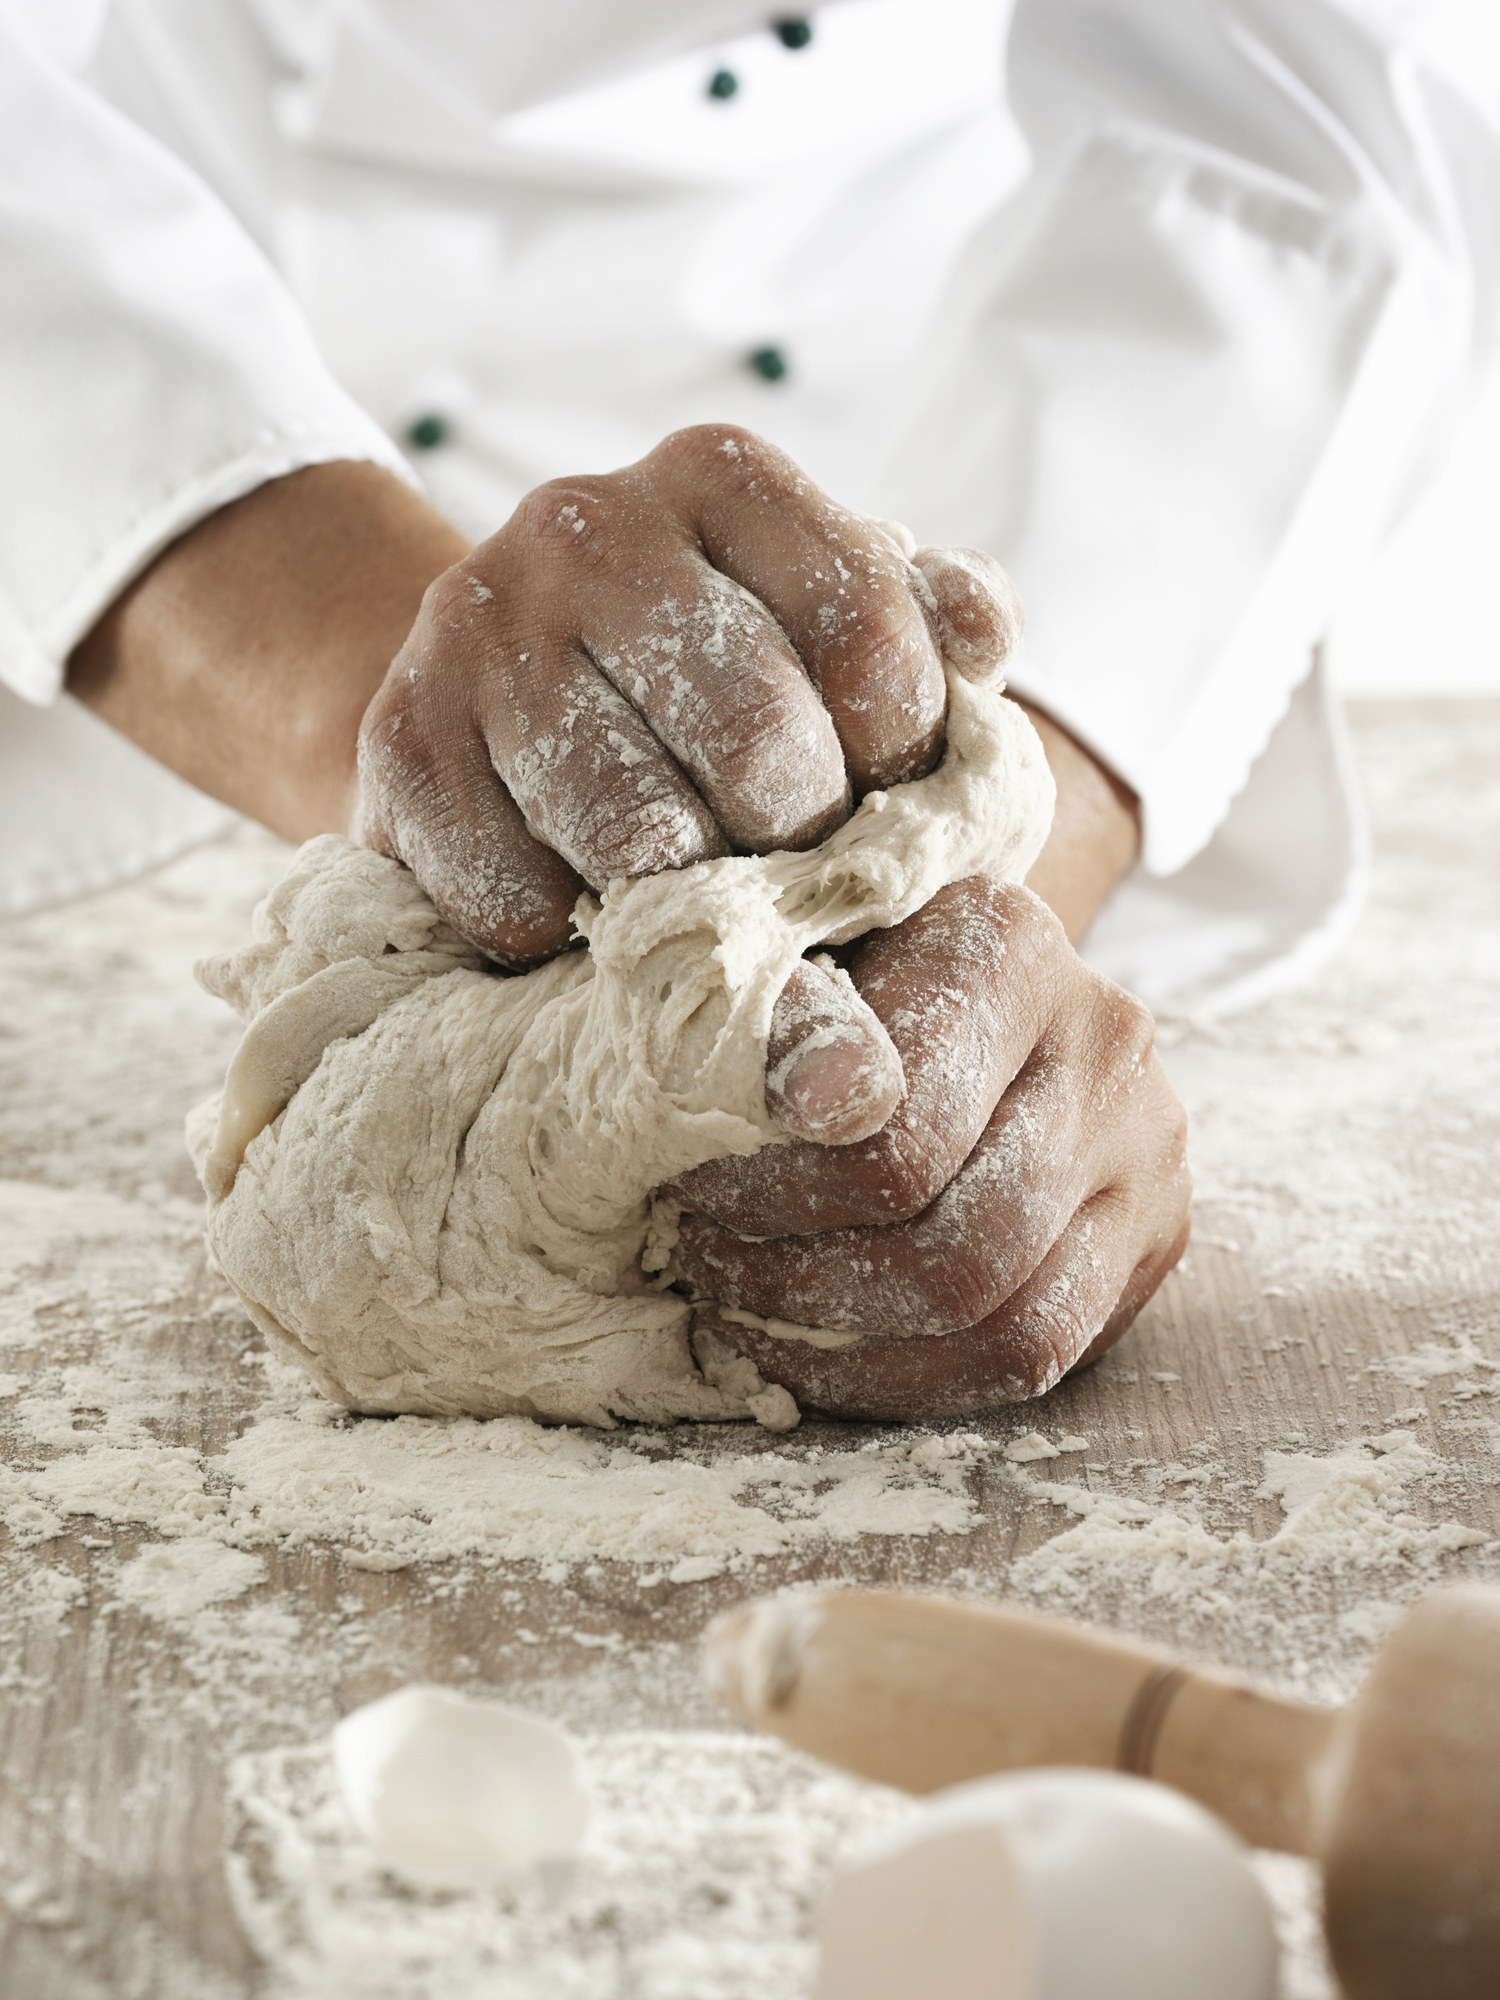 Male chef kneading dough